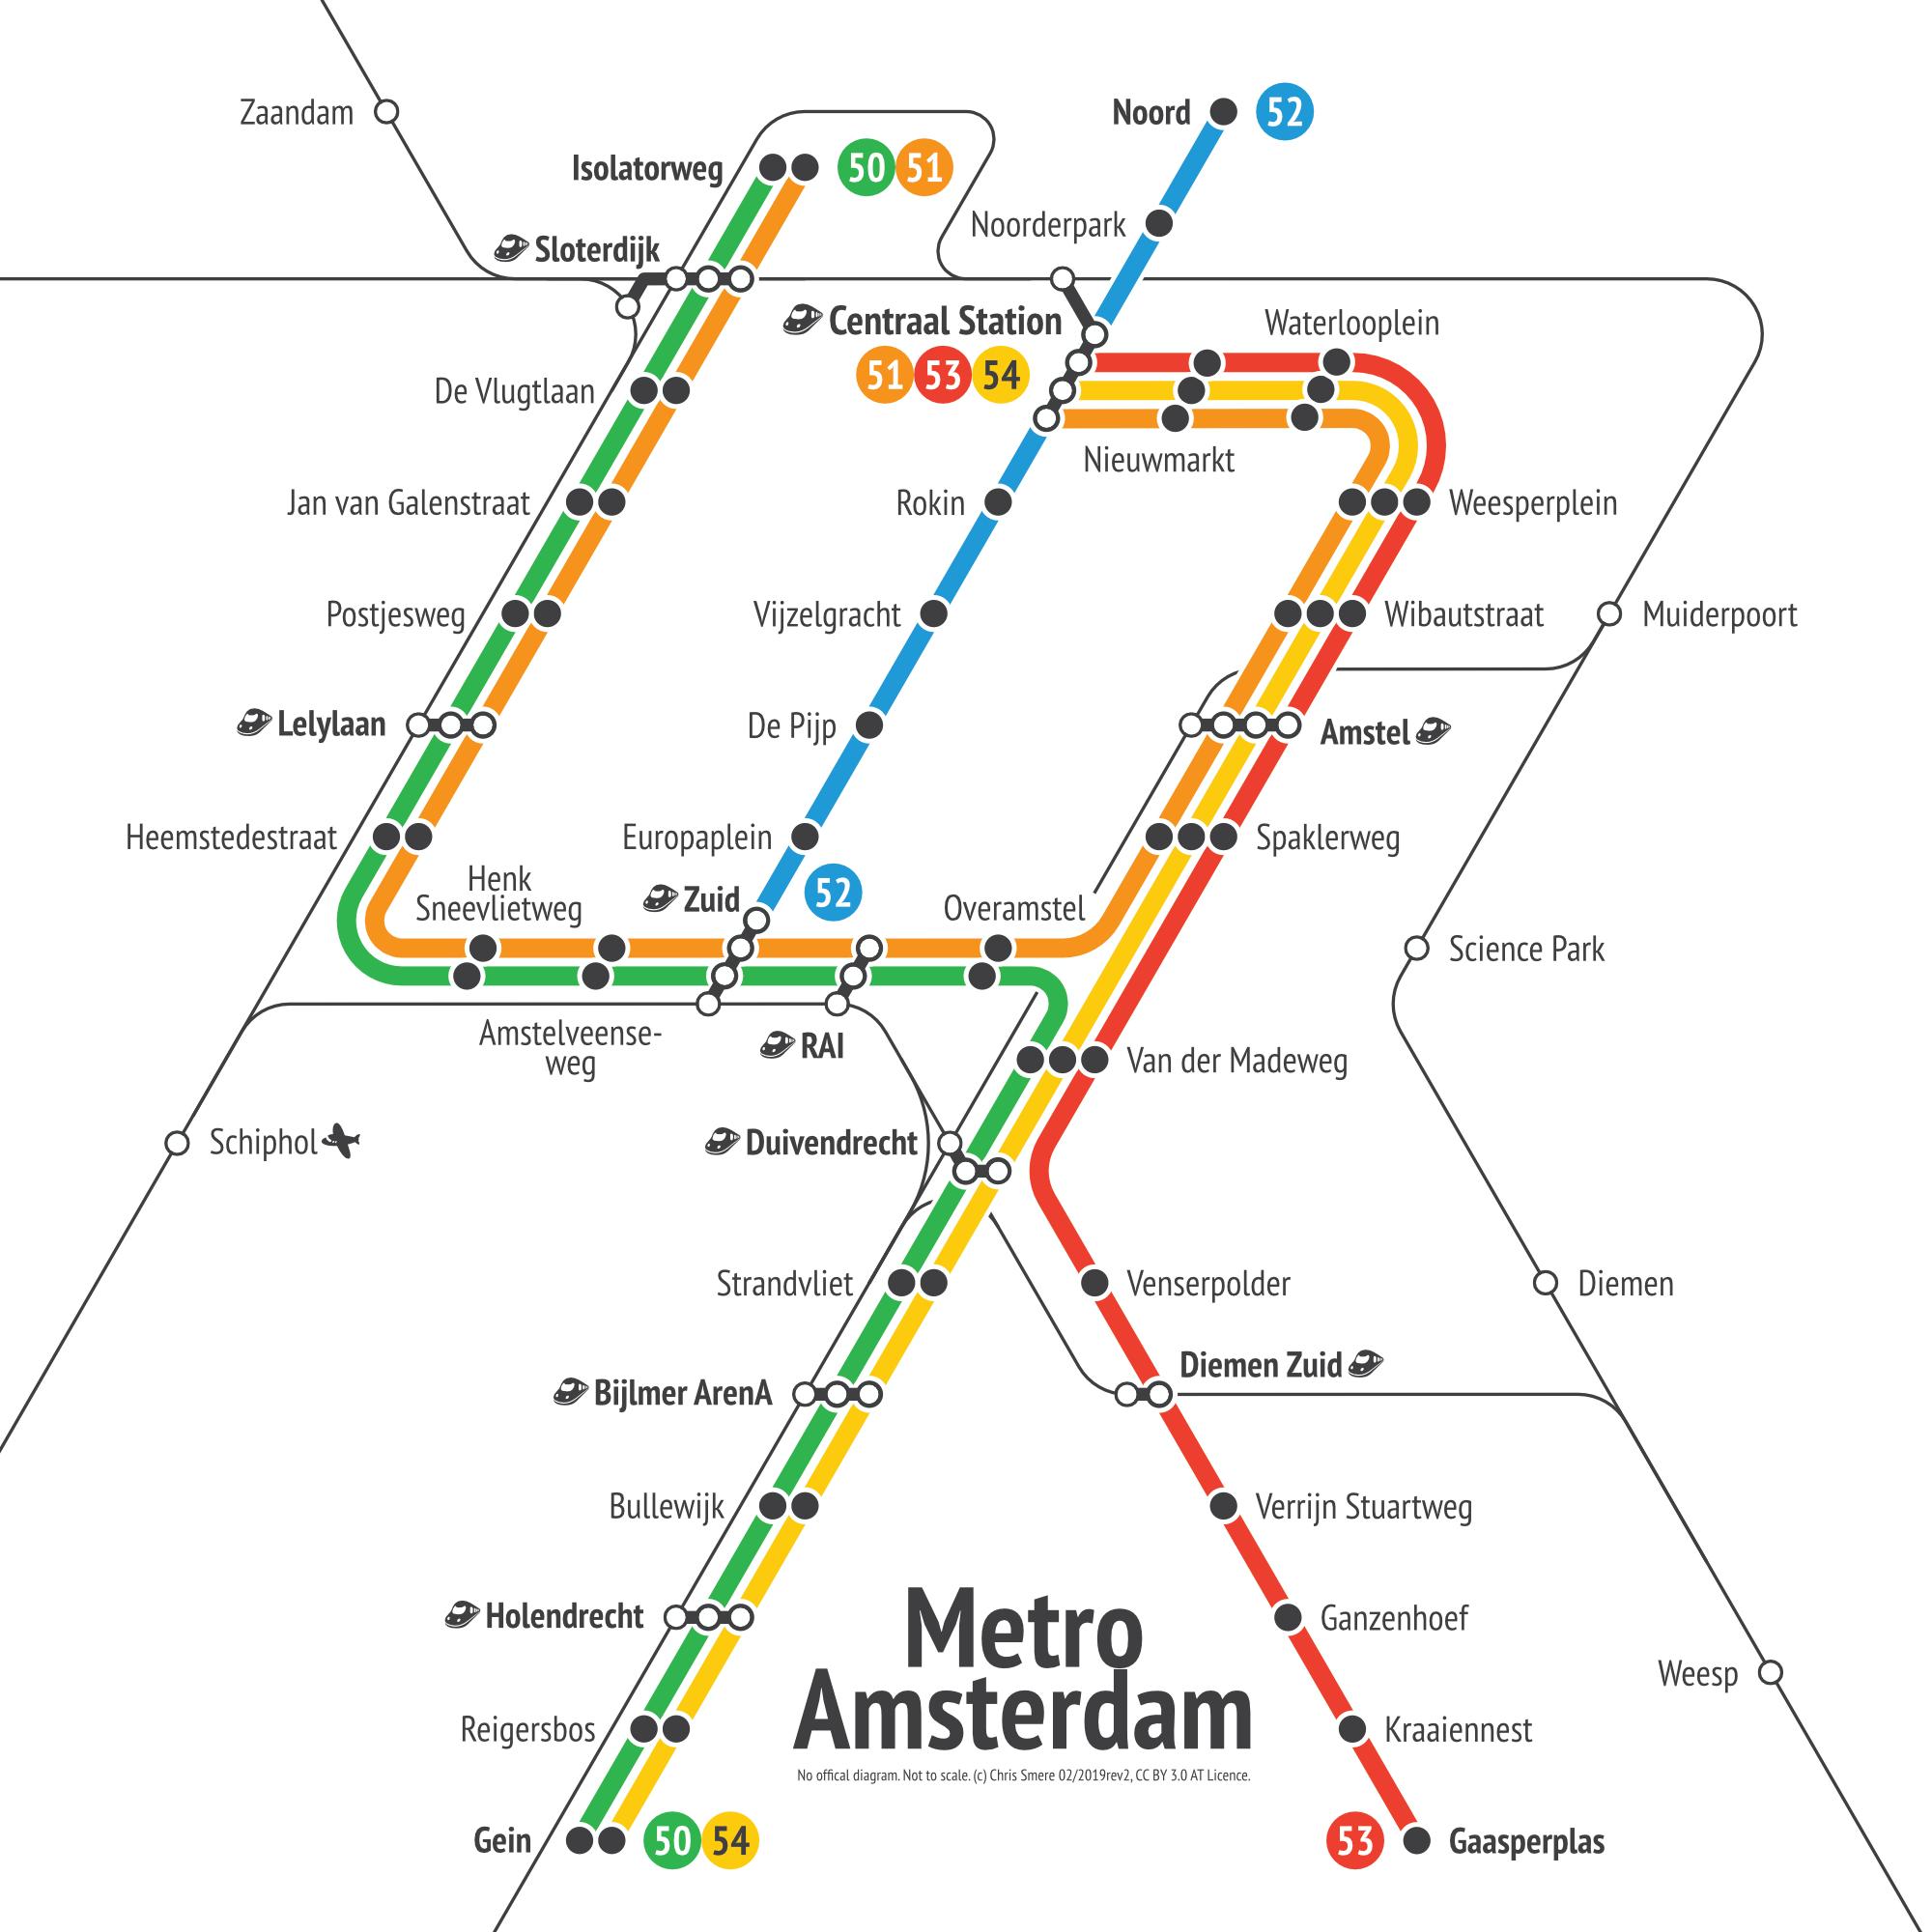 Amsterdam - Metro Transit Diagram